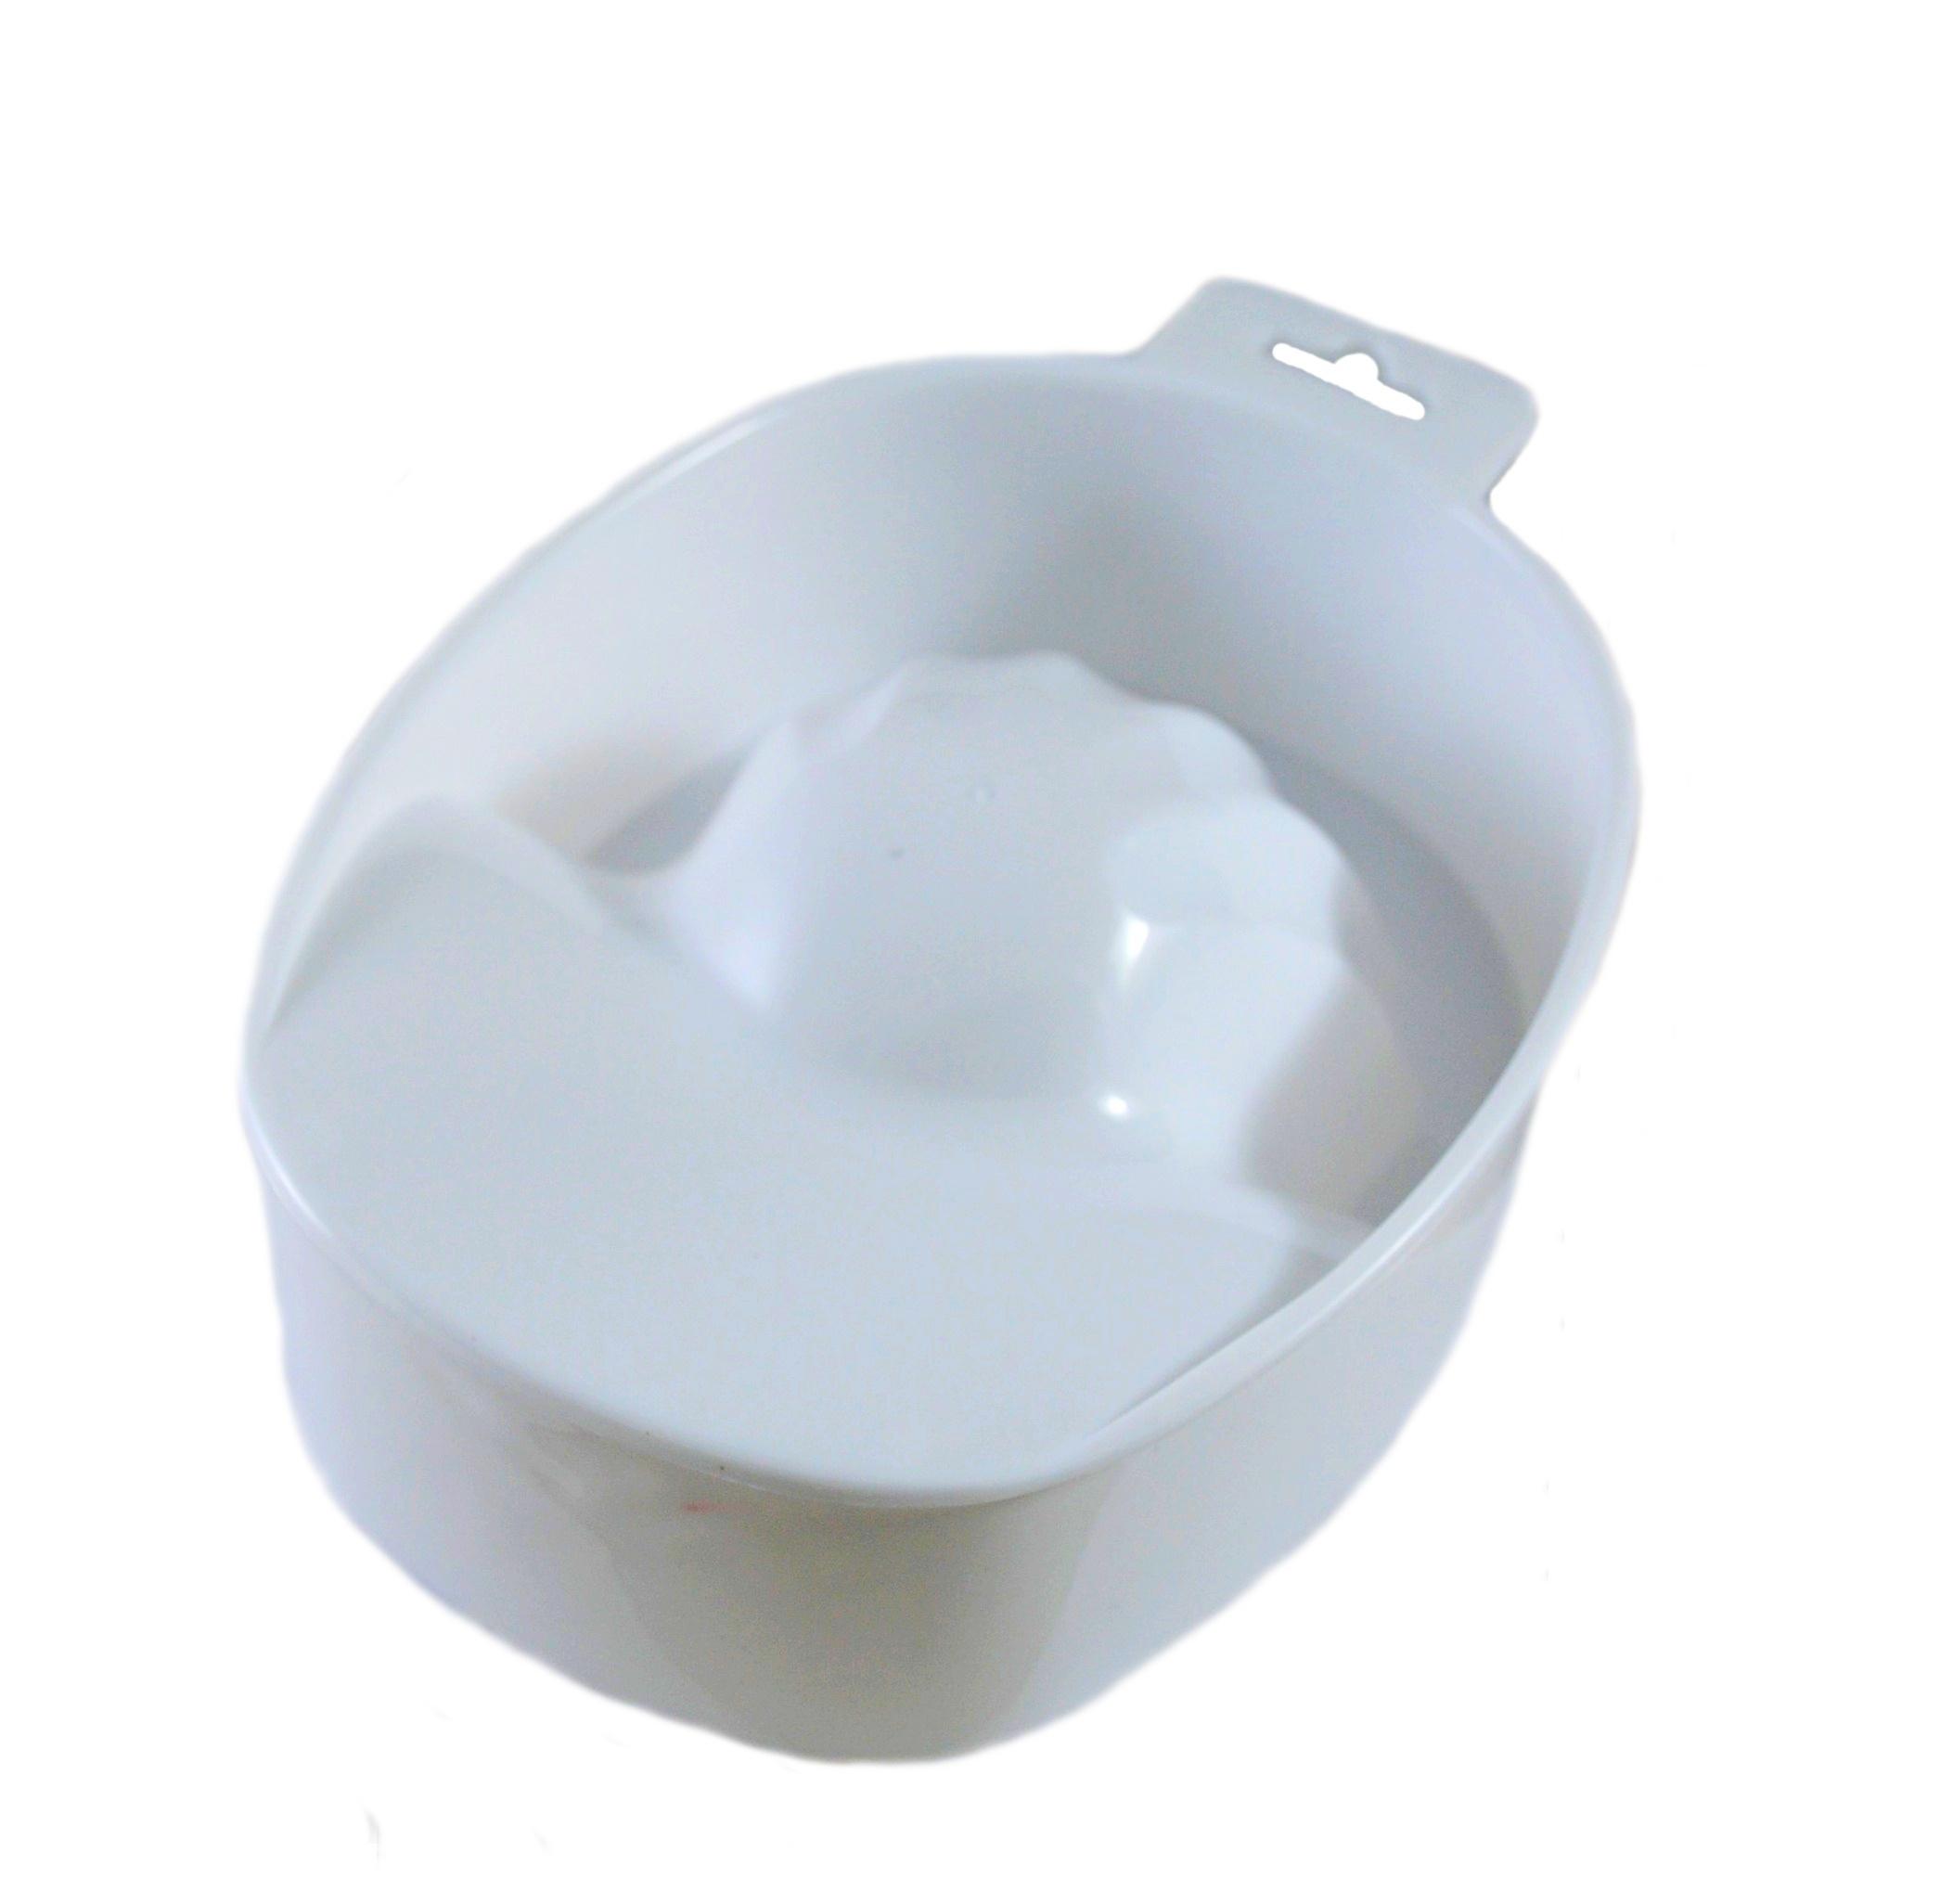 Ванночка для маникюра белая